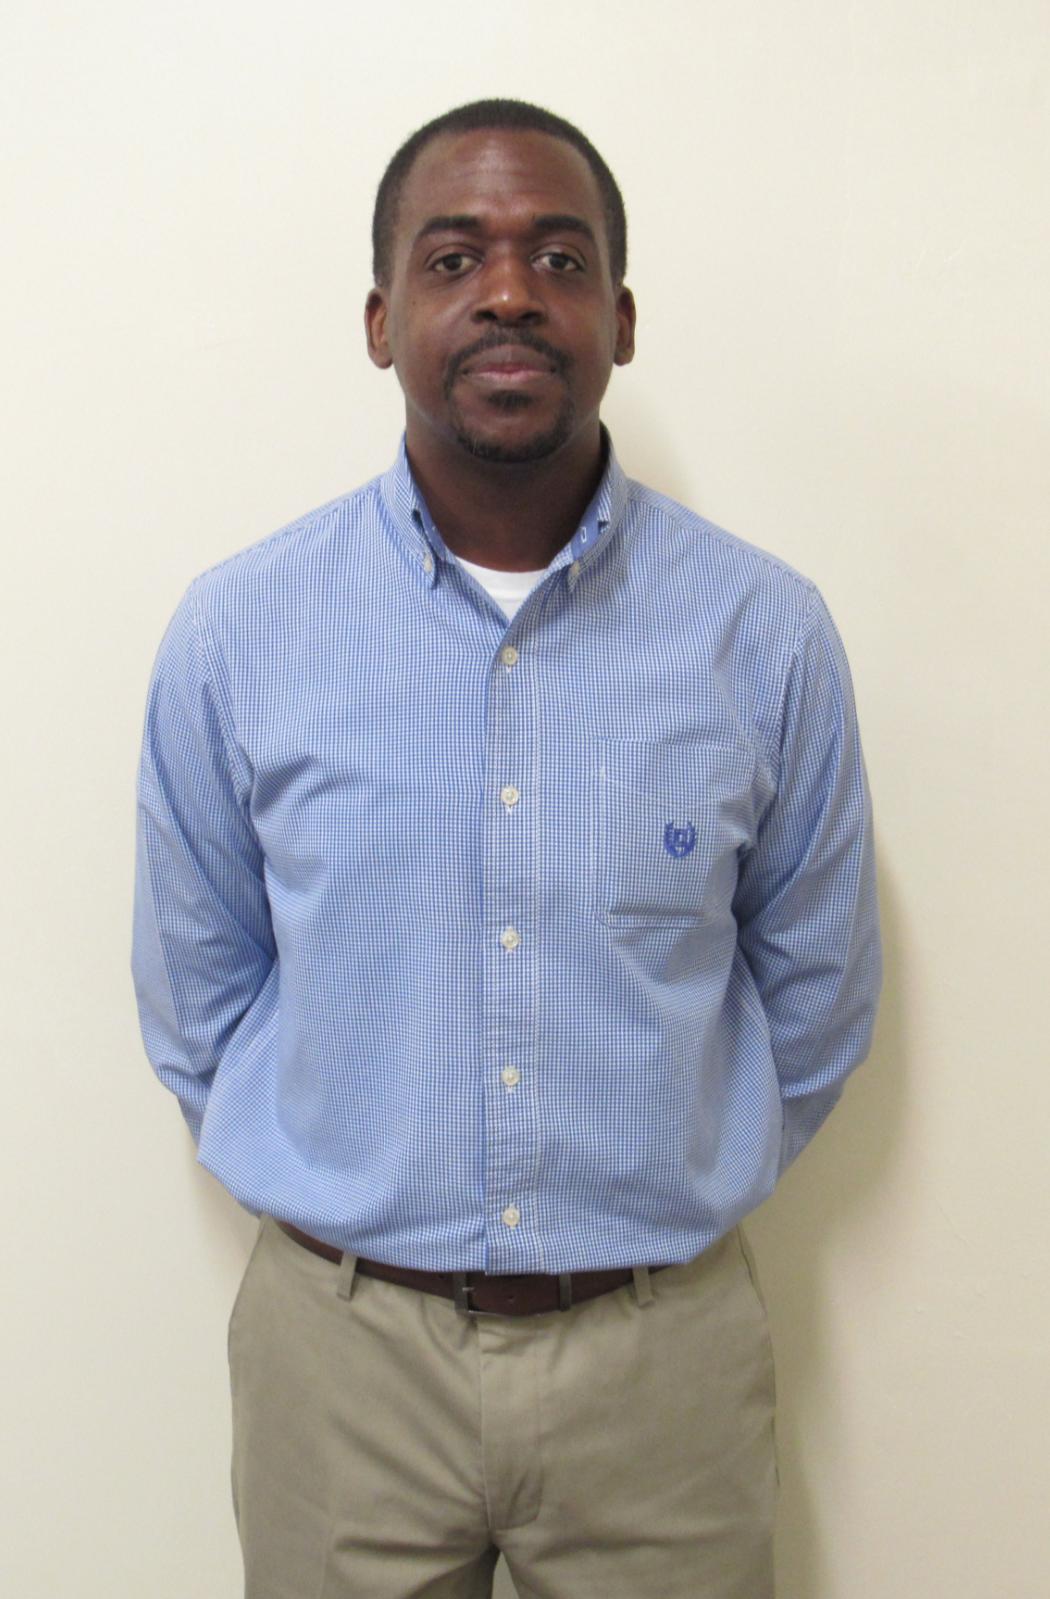 Director of Program Development & Evaluation – Michael Woods